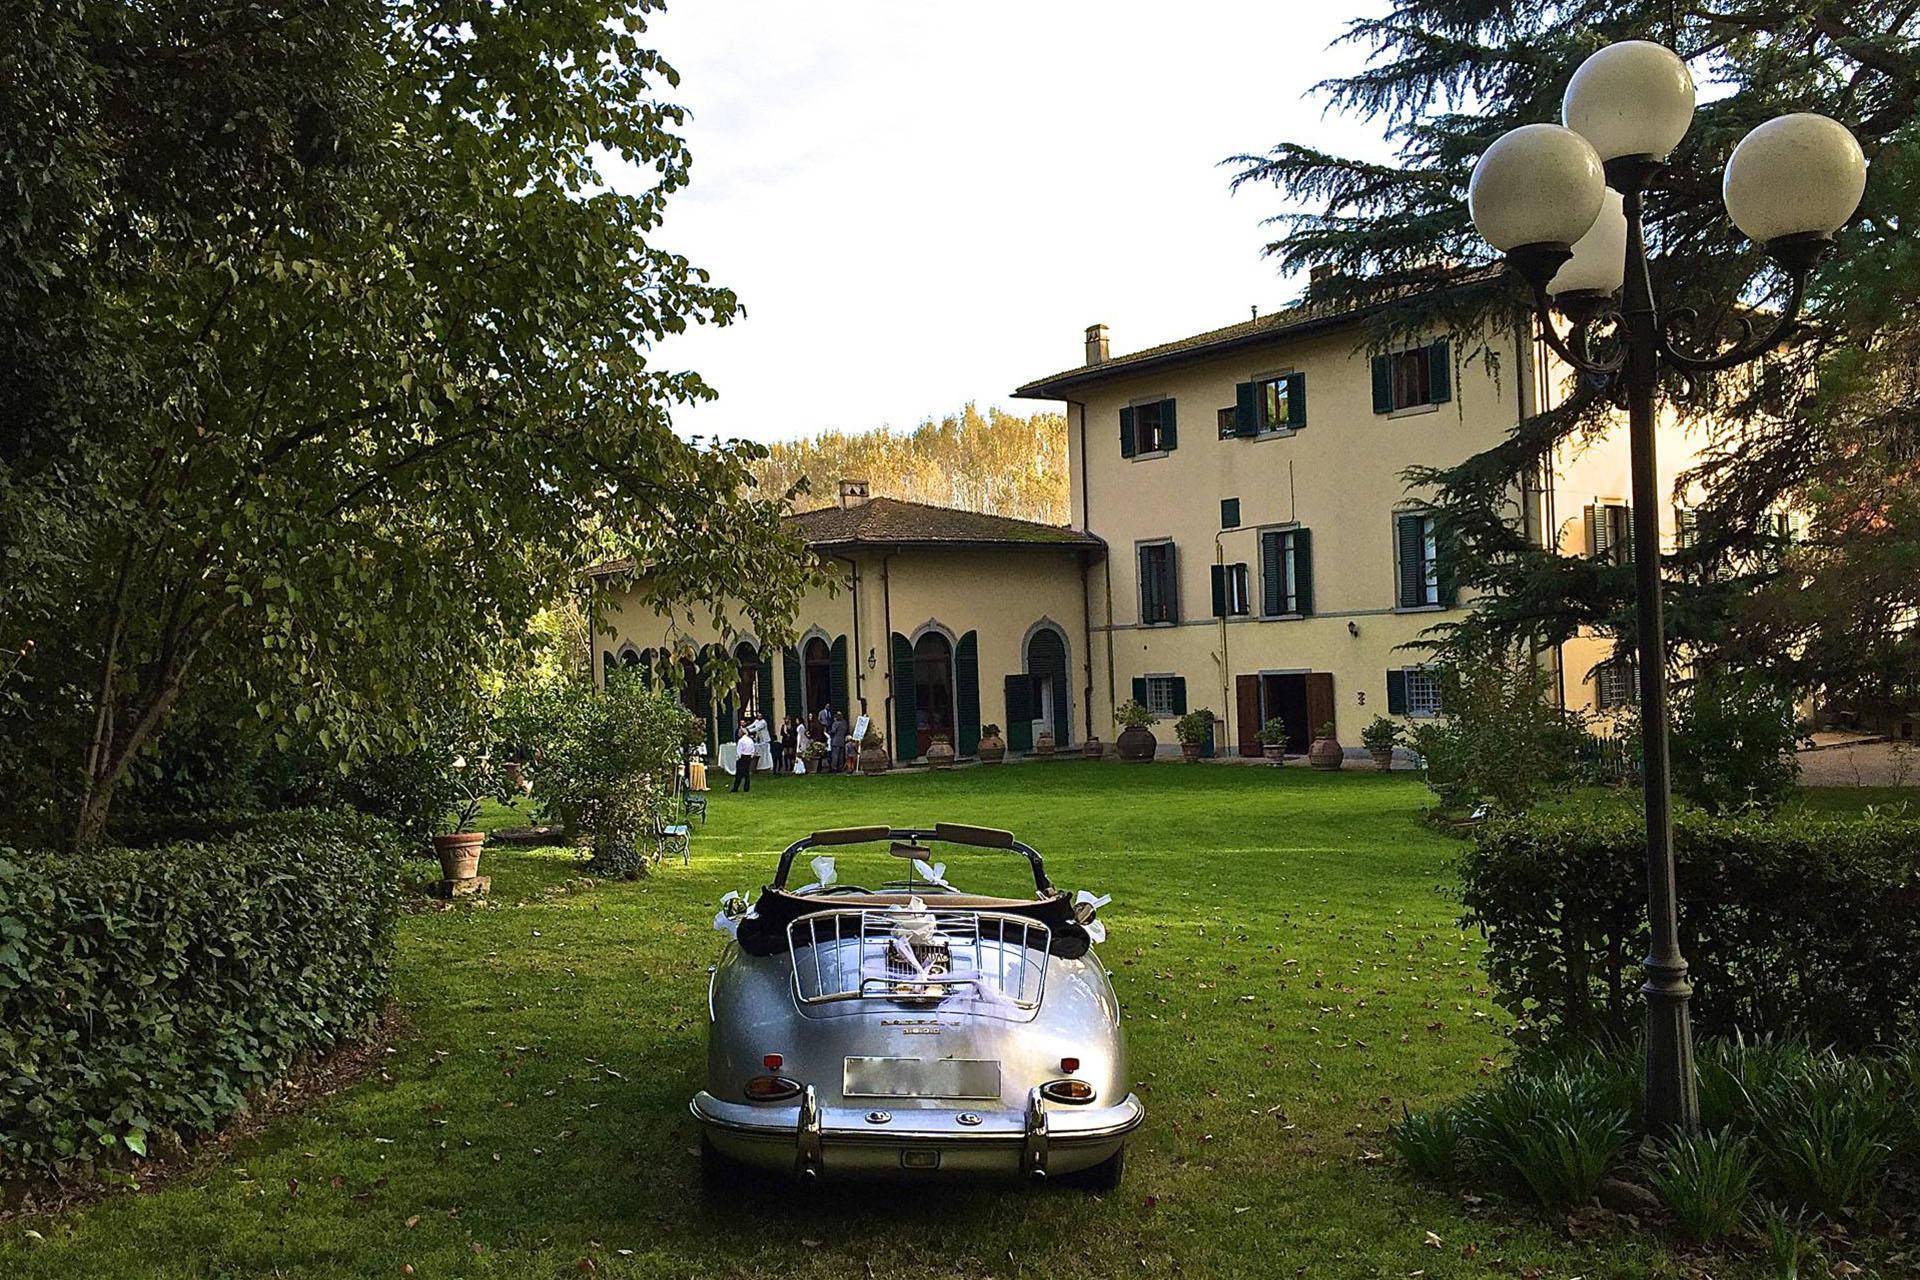 Location Matrimoni Toscana Prezzi : Location matrimoni firenze empoli